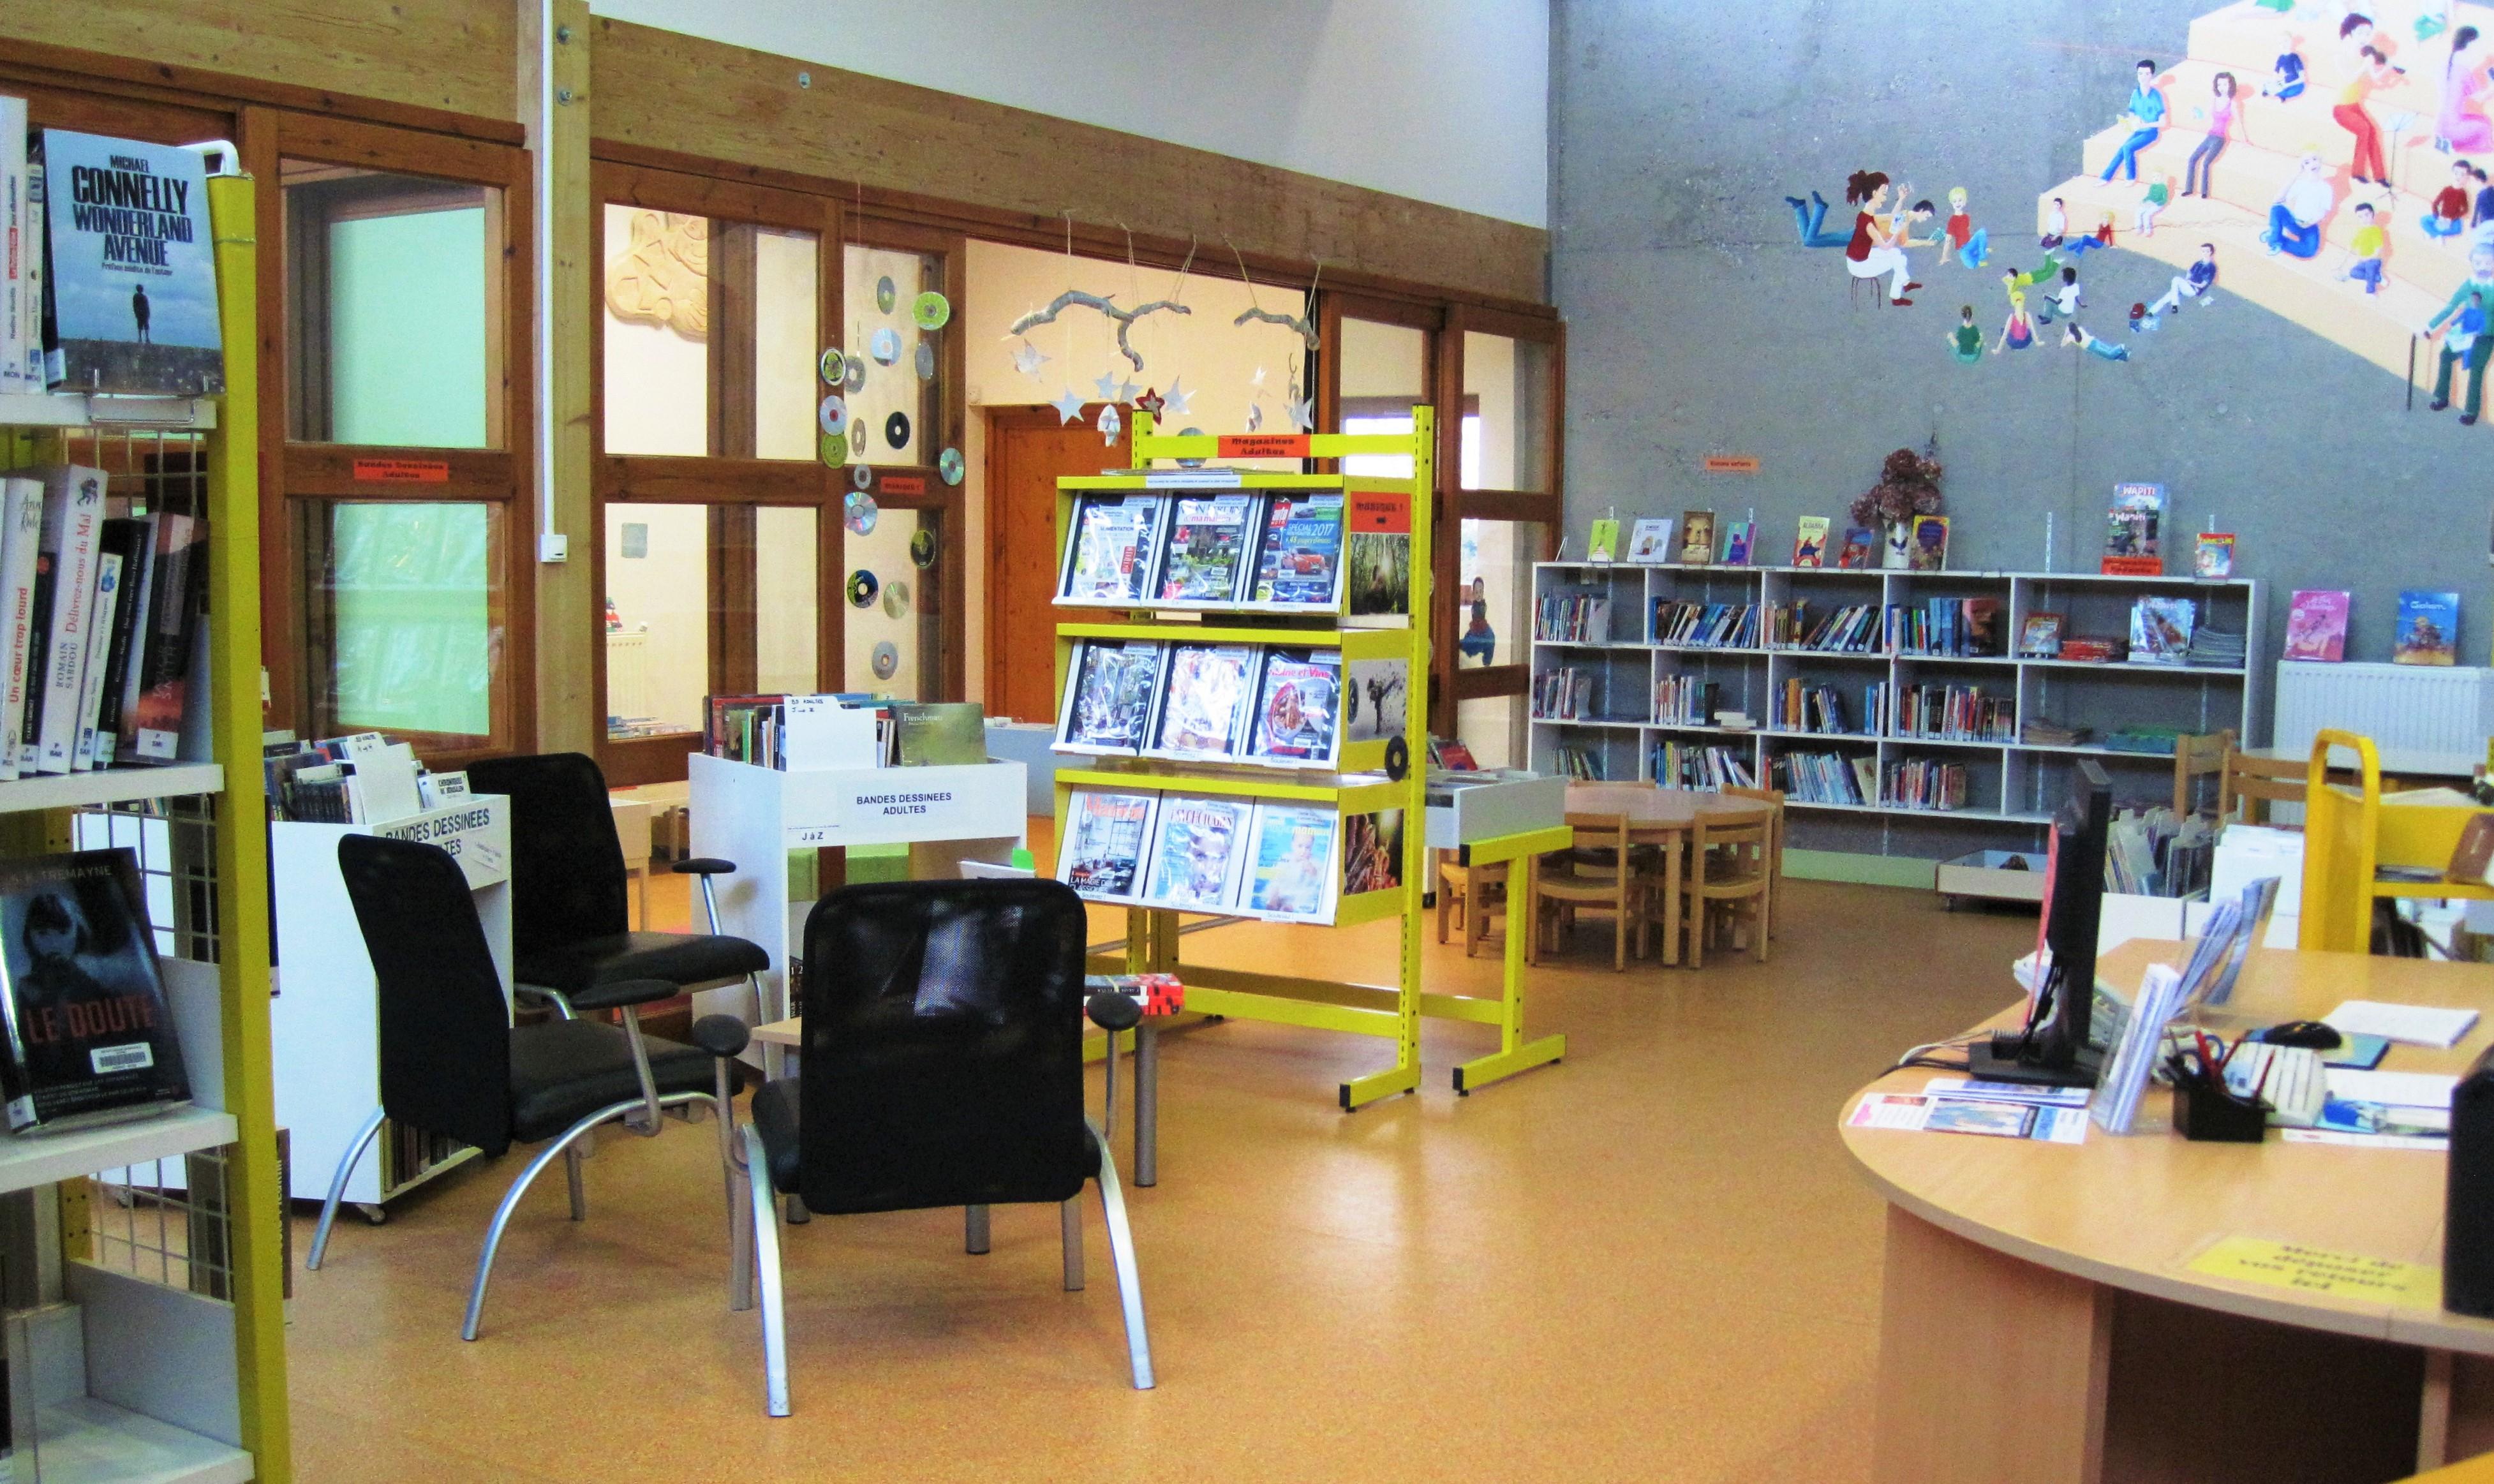 mediatheque interieur.JPG